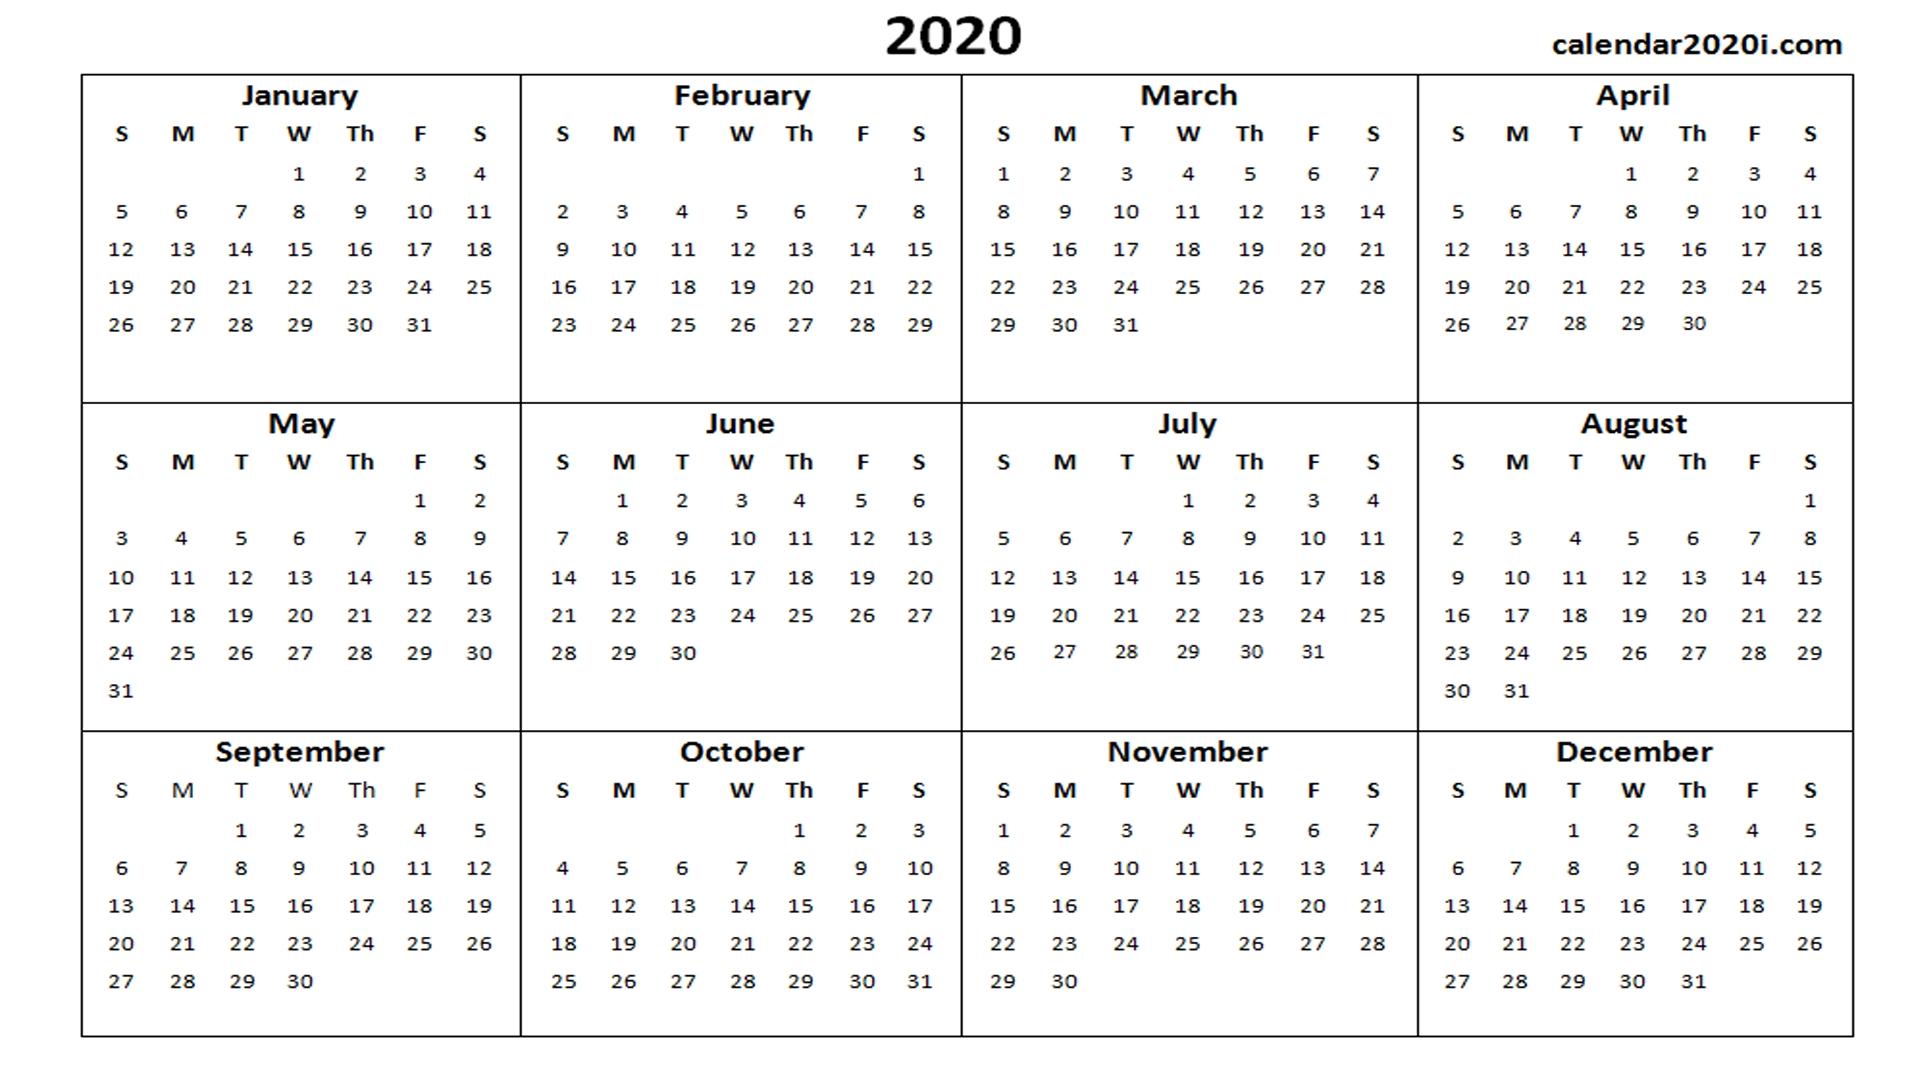 2020 Calendar Printable Template Holidays, Word, Excel, Pdf